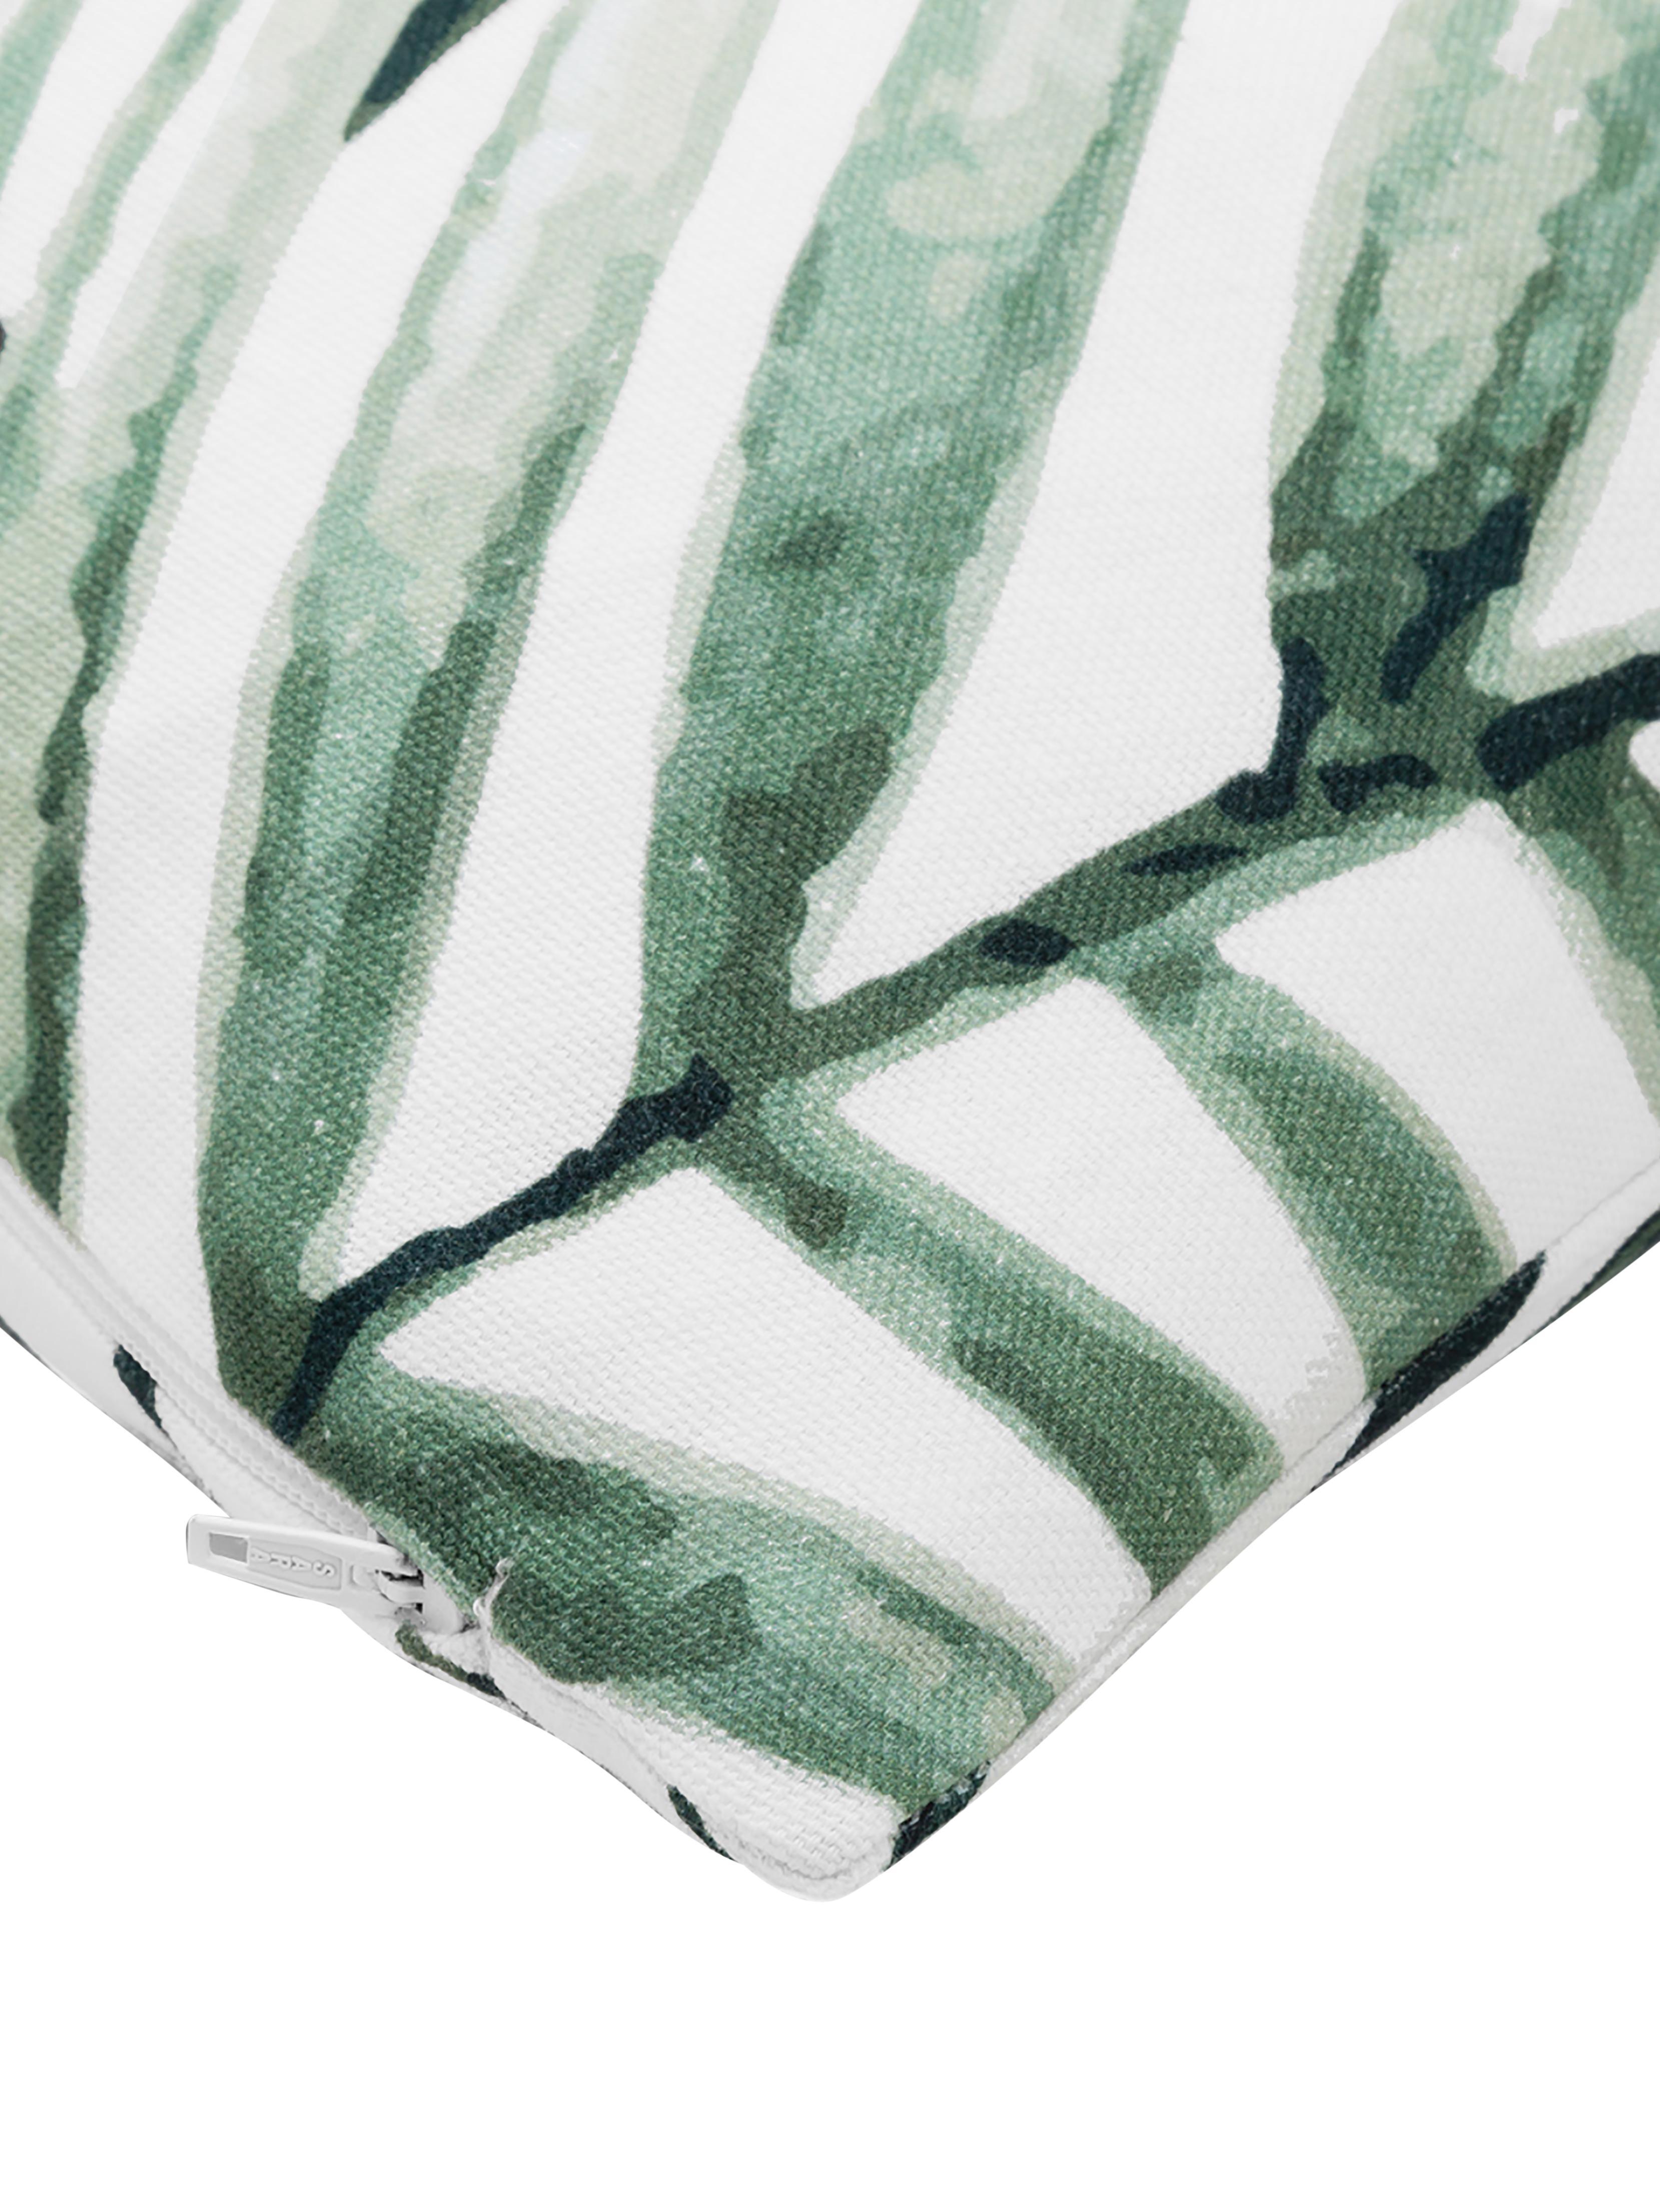 Kissenhülle Coast mit Blattmuster, 100% Baumwolle, Grün, Weiß, 50 x 50 cm